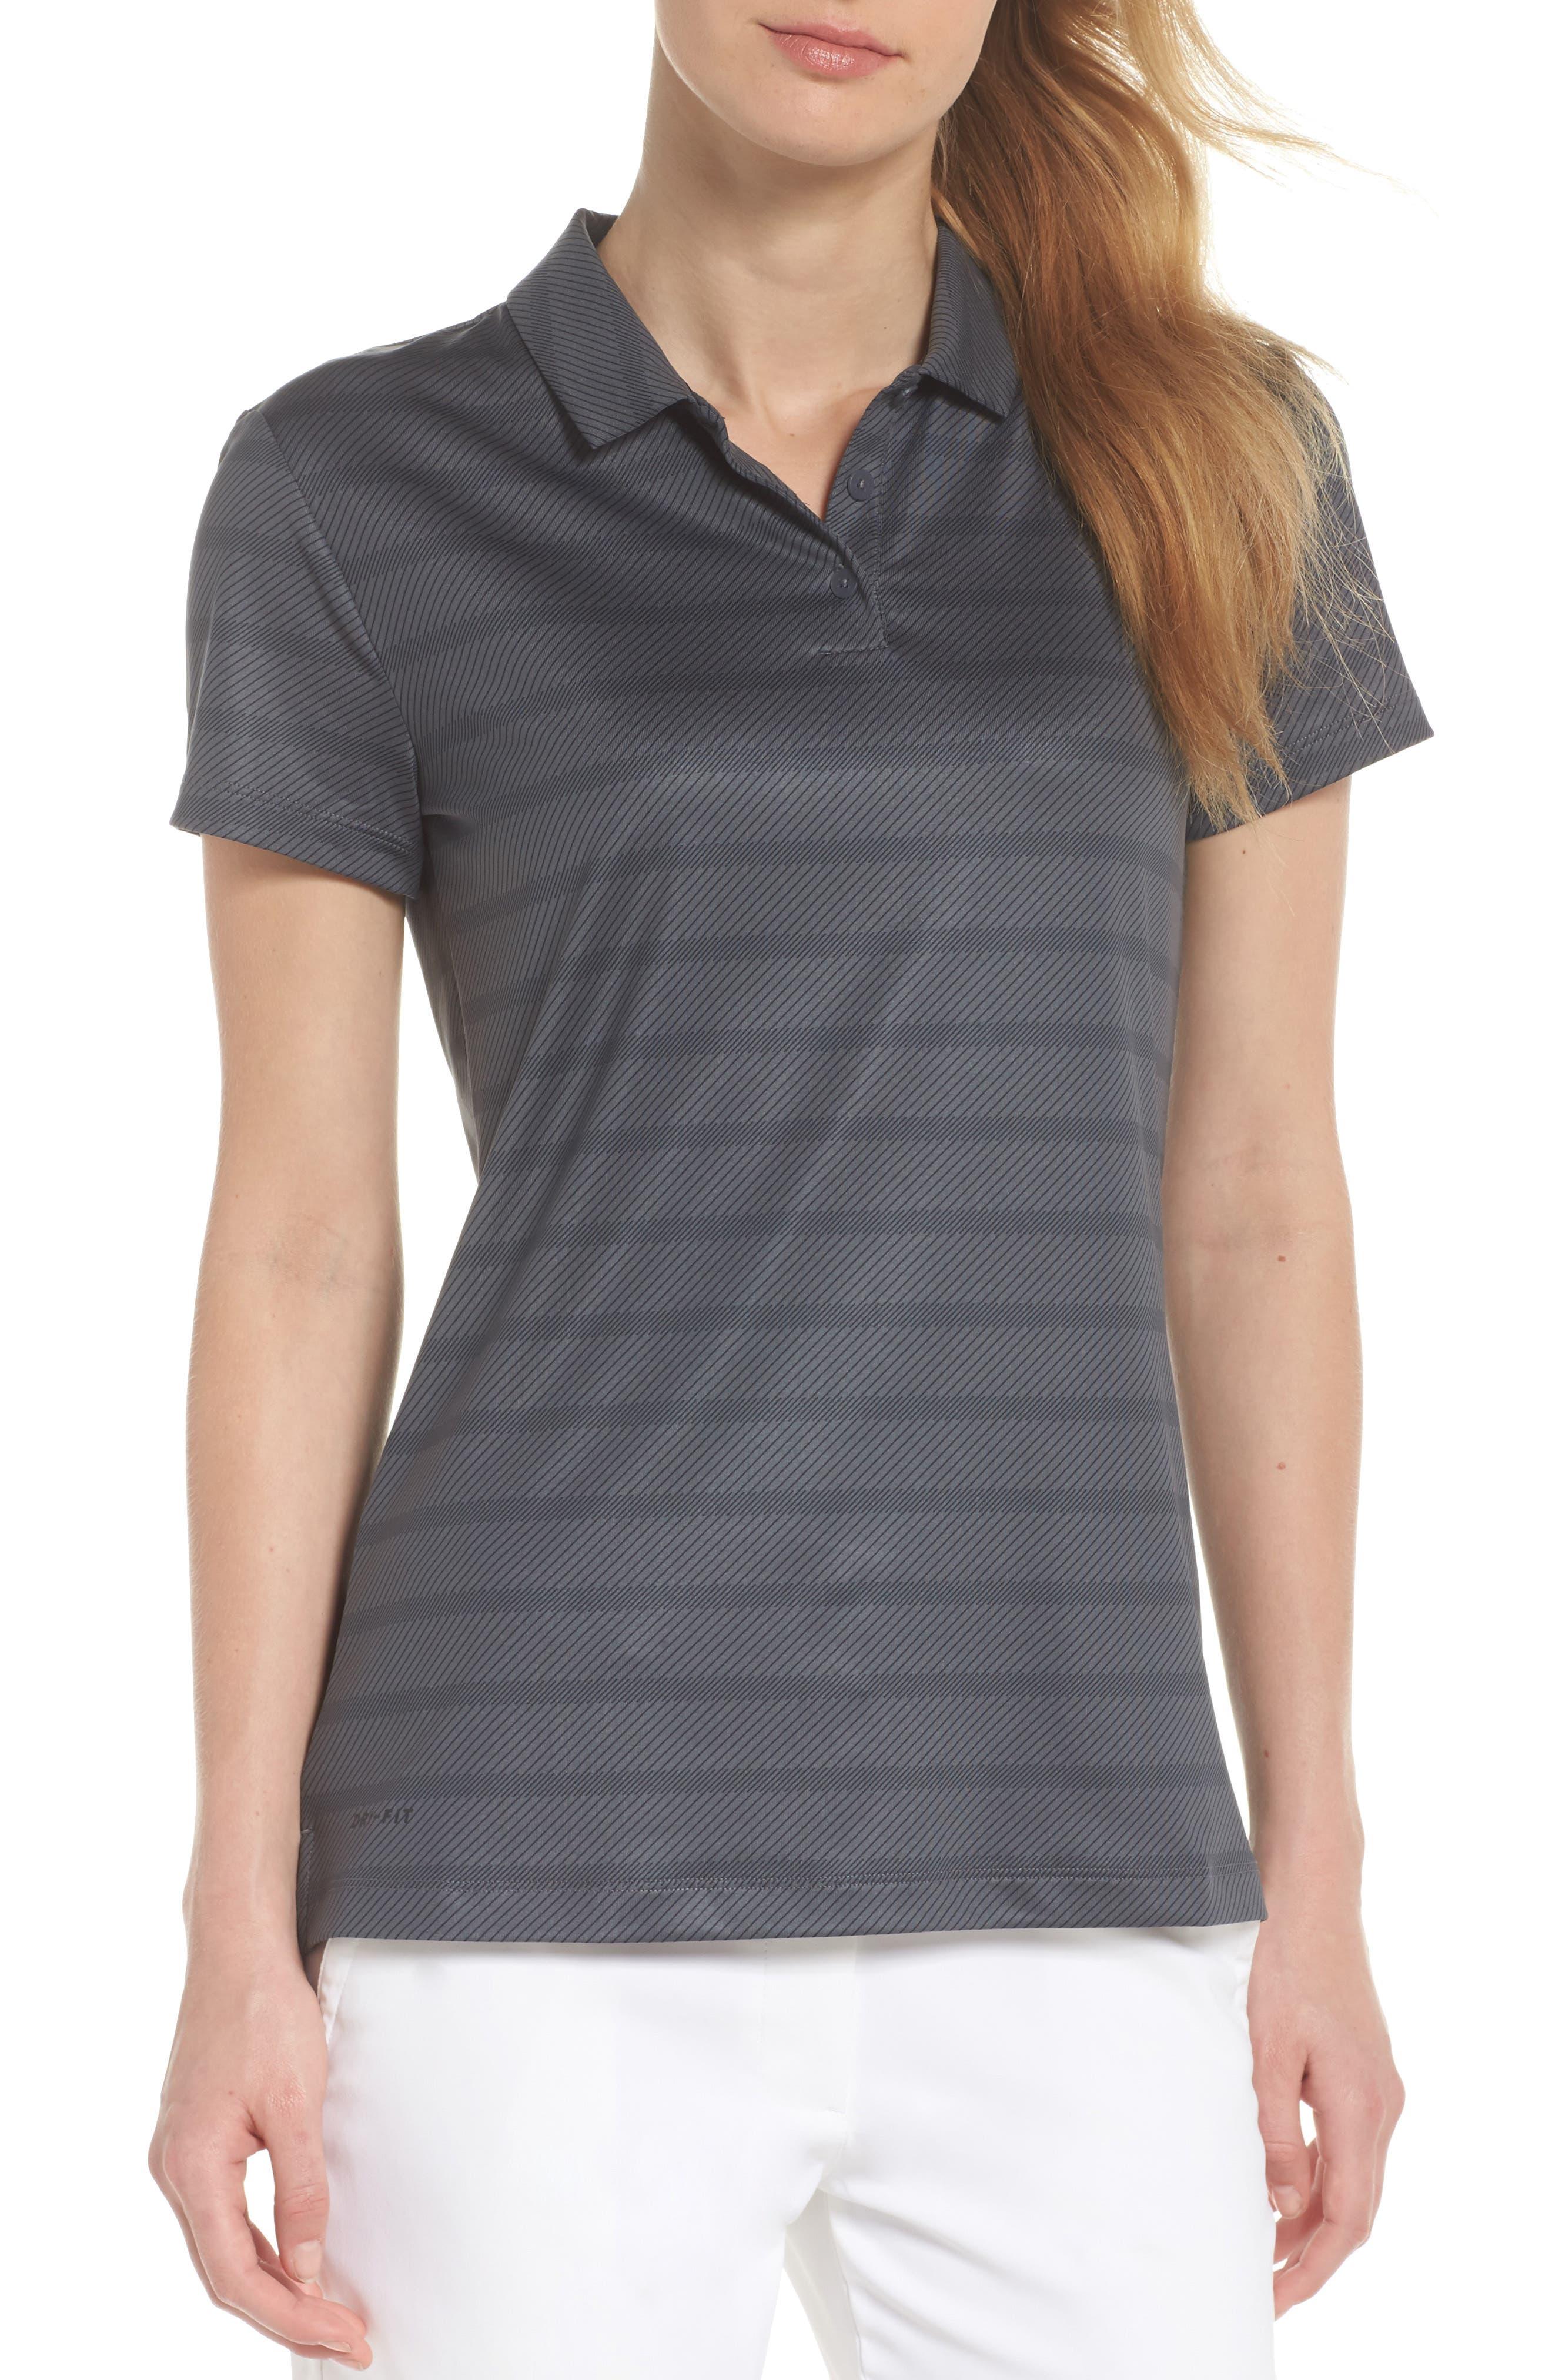 Dry Golf Polo,                             Main thumbnail 1, color,                             Dark Grey/ Black/ Black